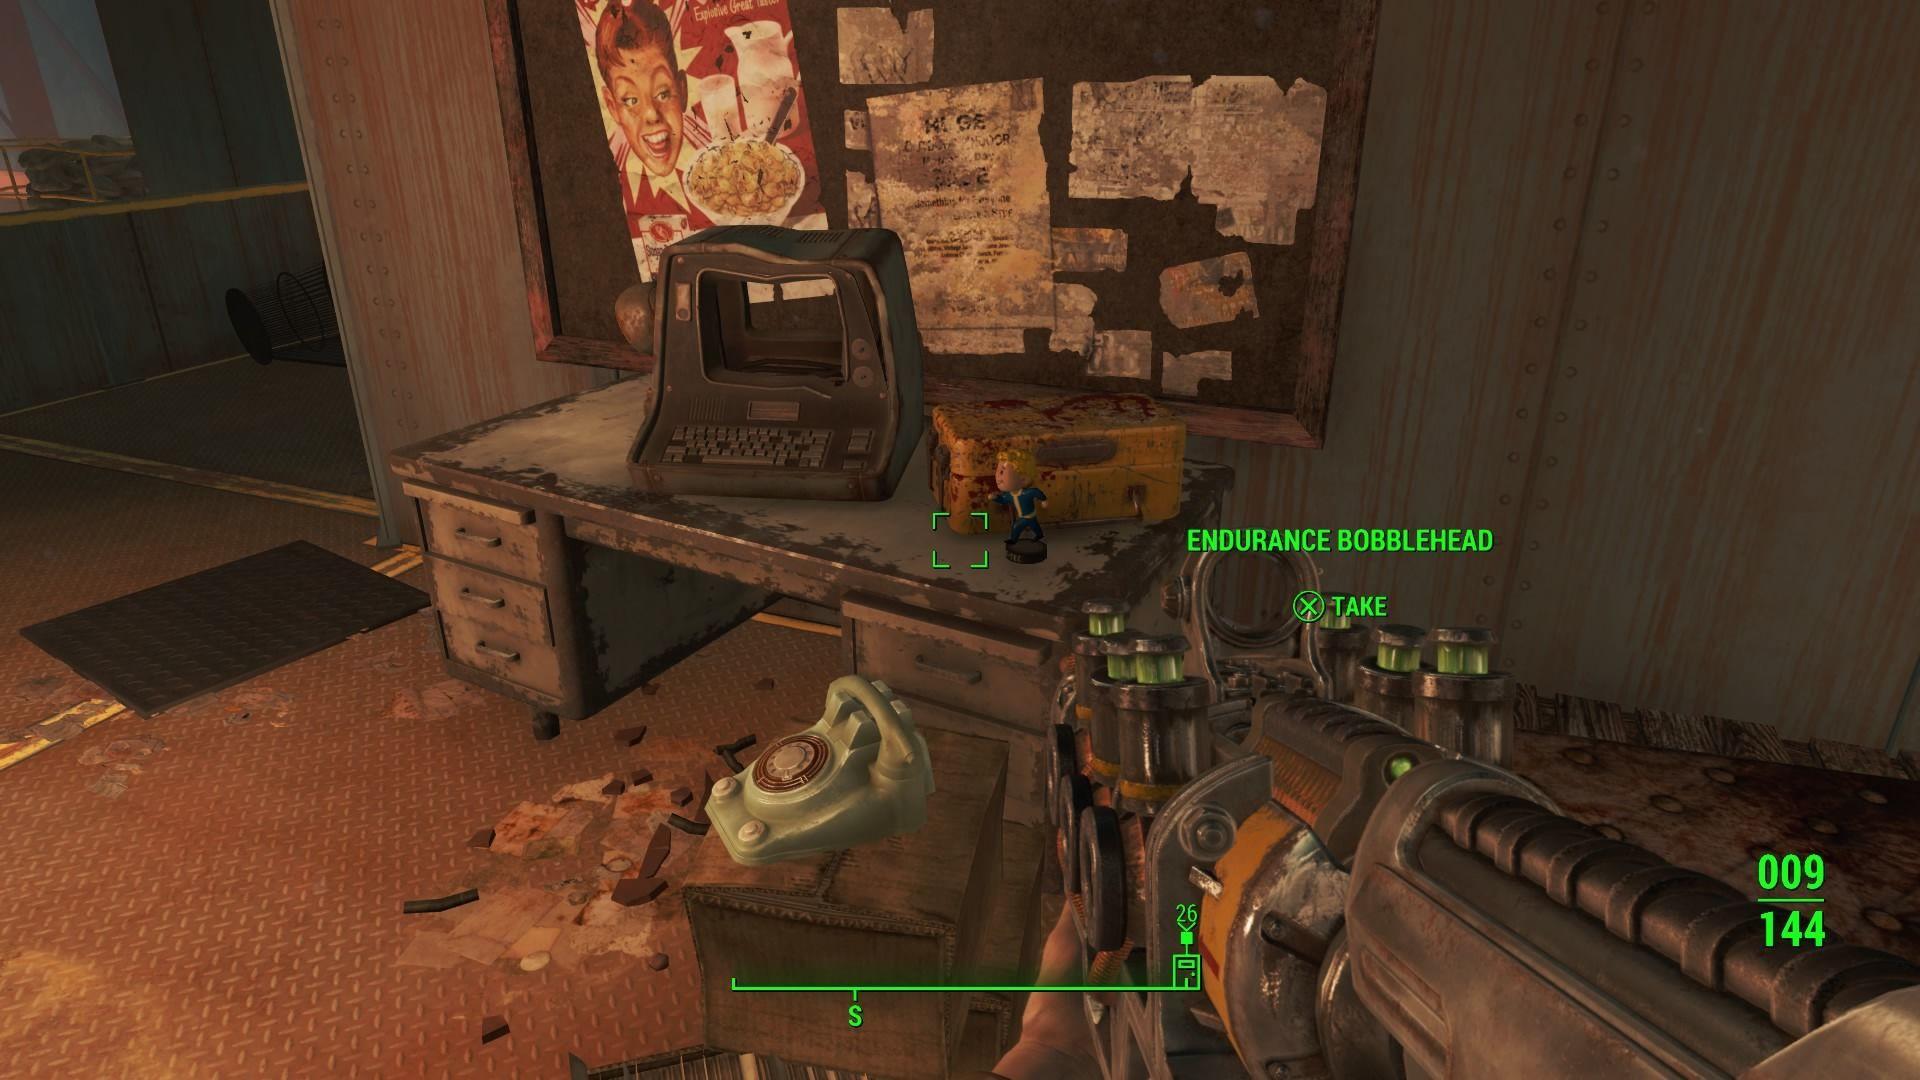 Endurance Bobblehead Fallout 4 Wiki